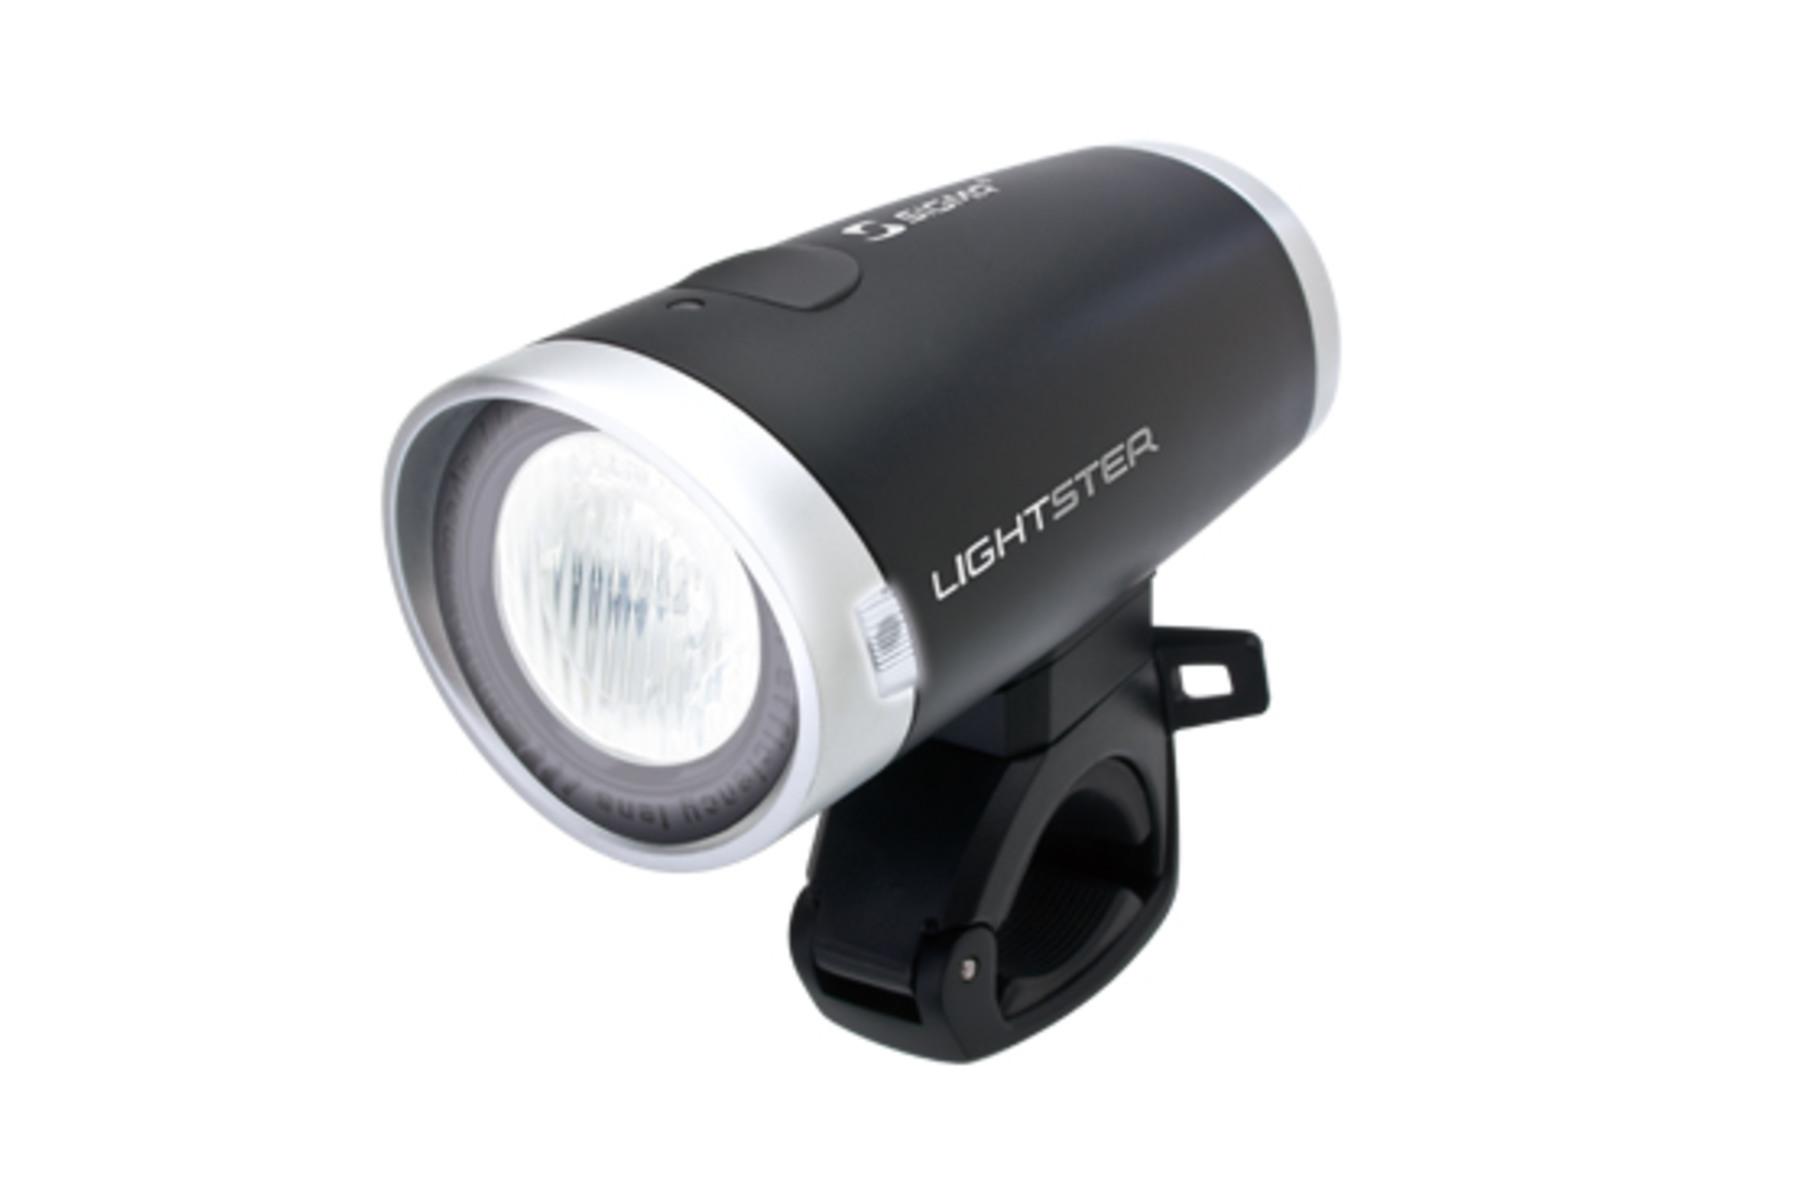 SIGMA LIGHTSTER led-koplamp kopen | ROSE Bikes